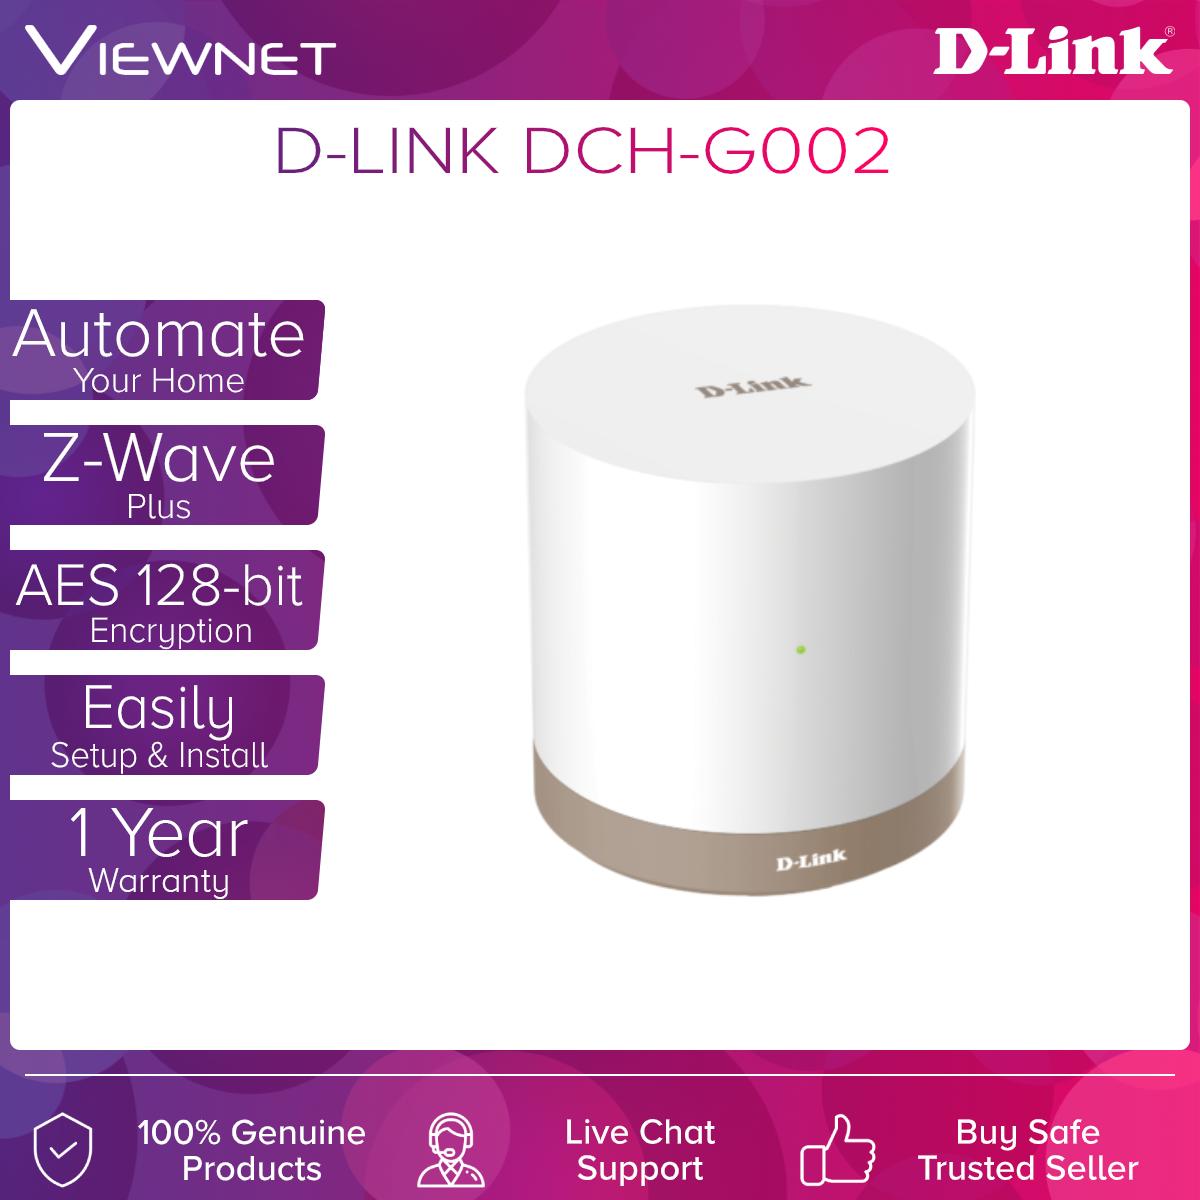 "D-Link DCH-G022 mydlinkâ""¢ Connected Home Hub"